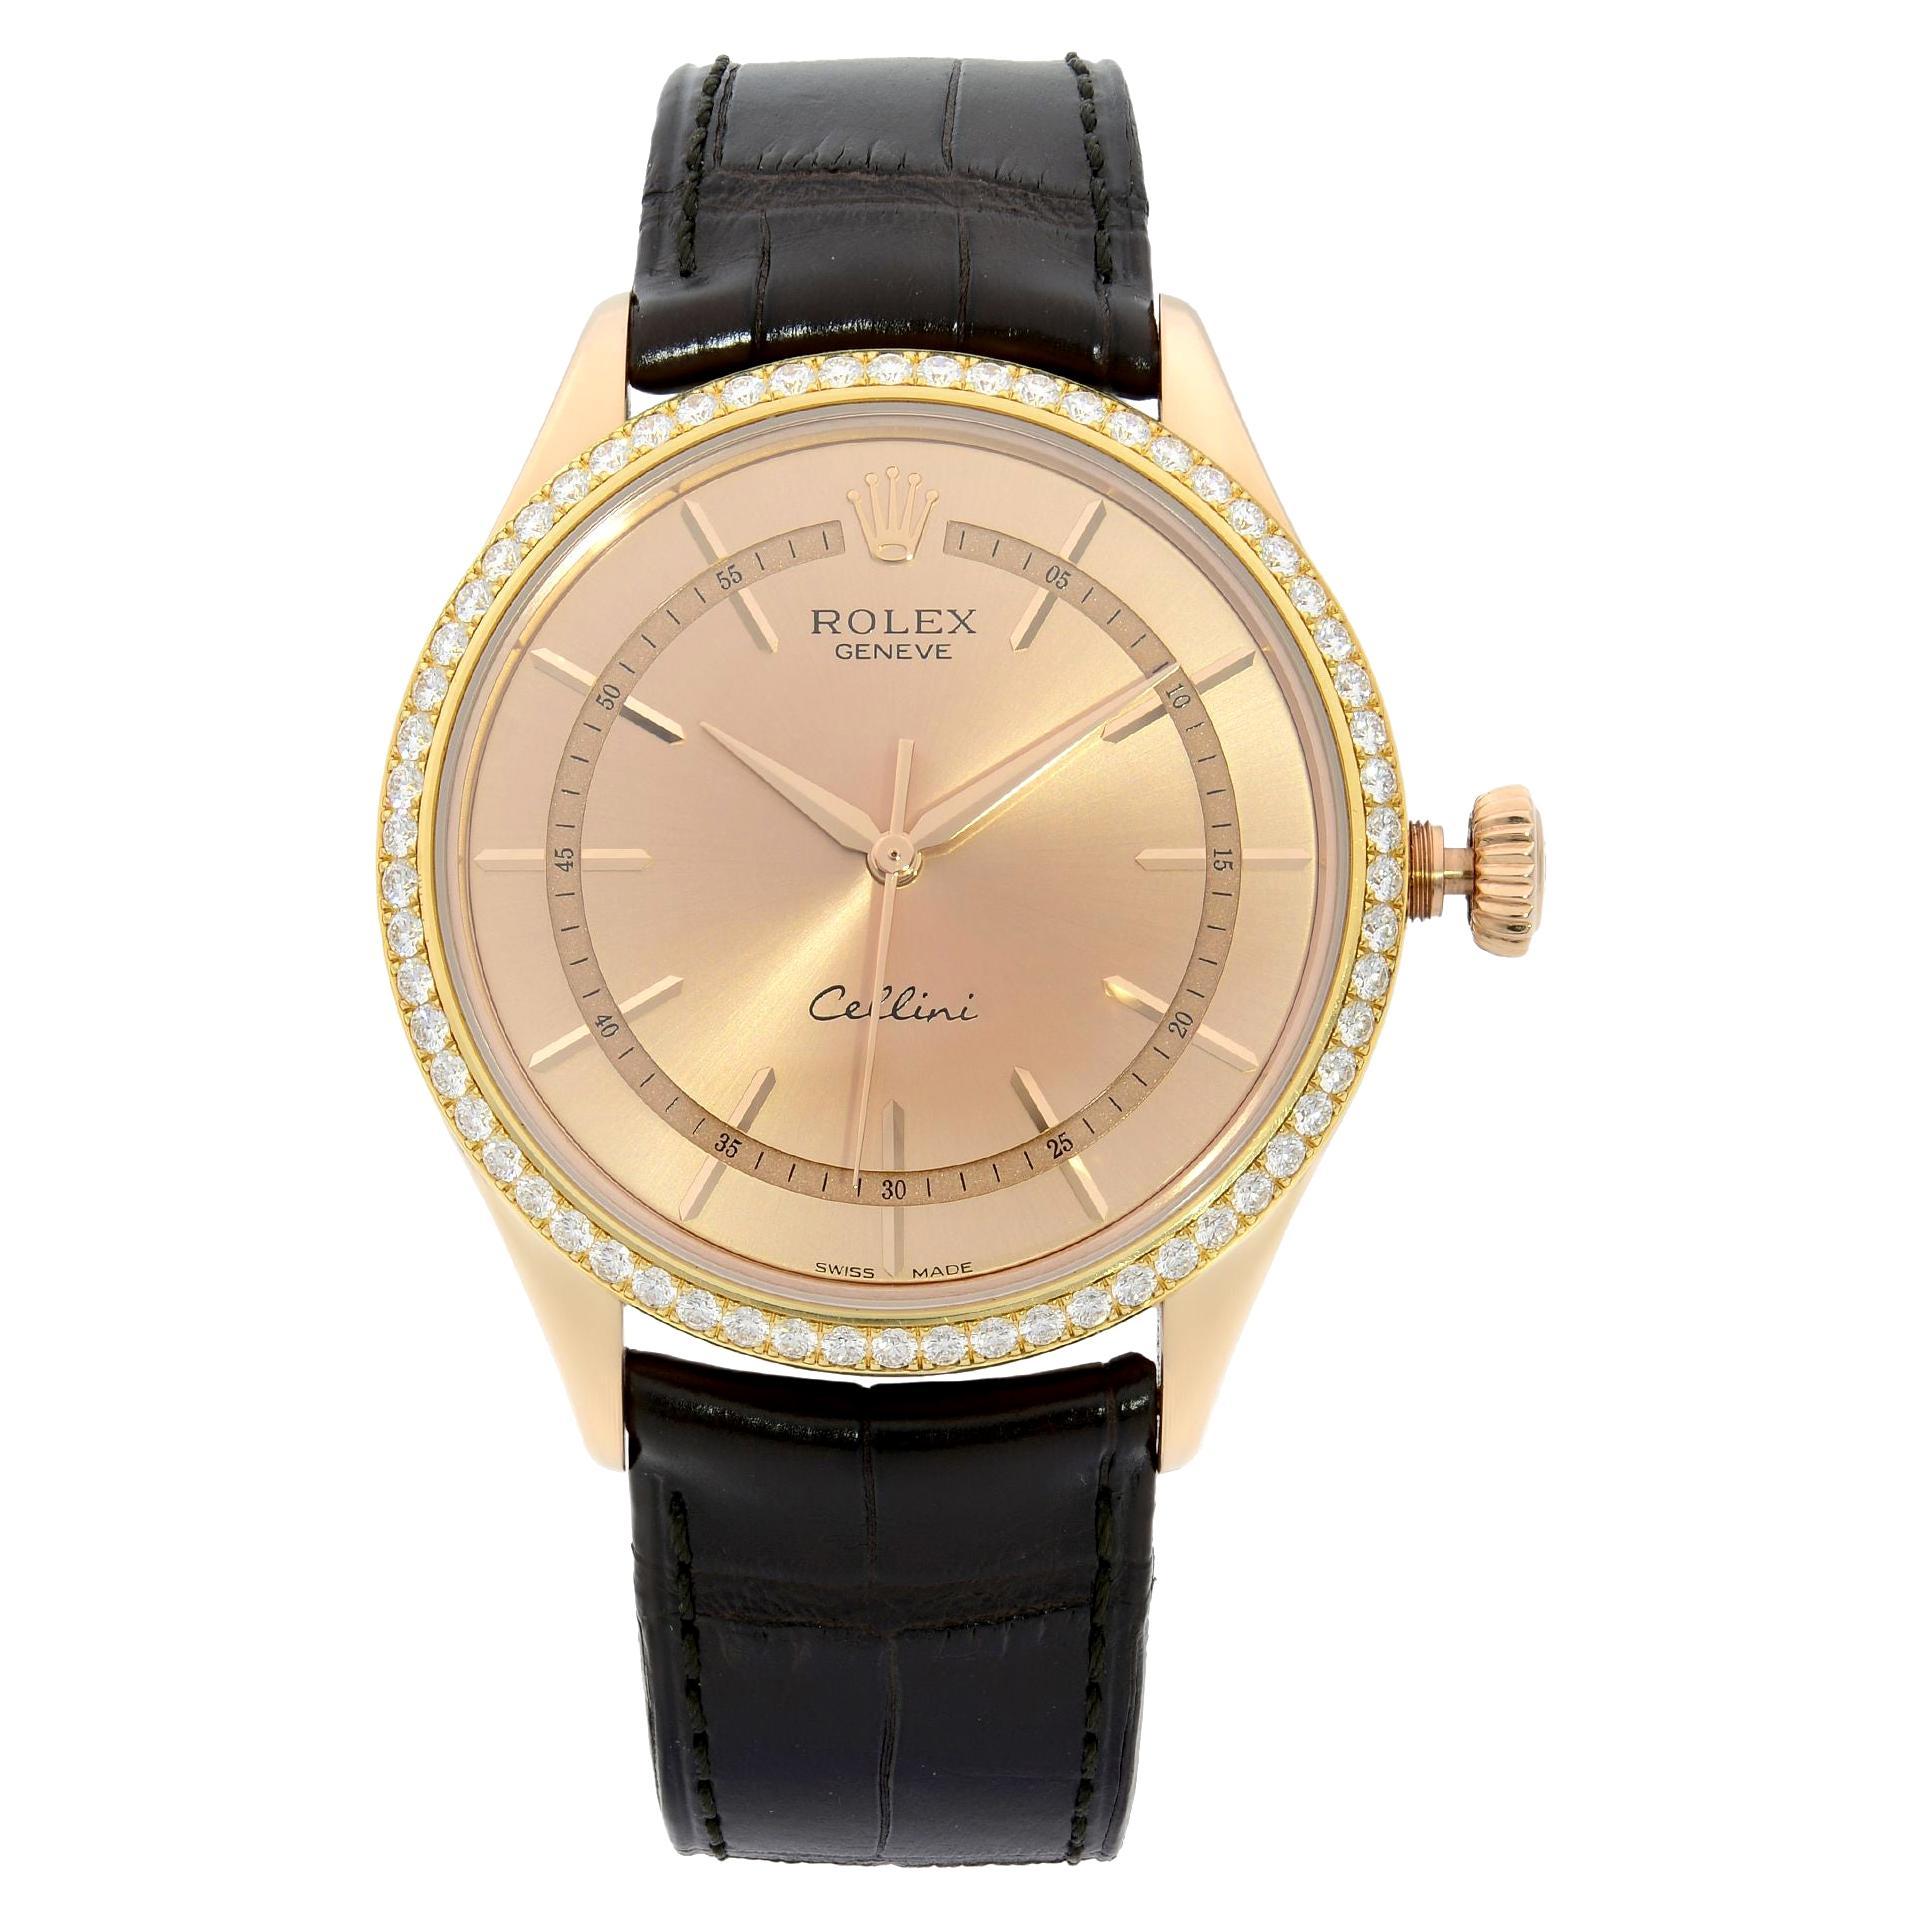 Rolex Cellini Time 18K Everose Gold Diamond Bezel Pink Dial Men's Watch 50705RBR